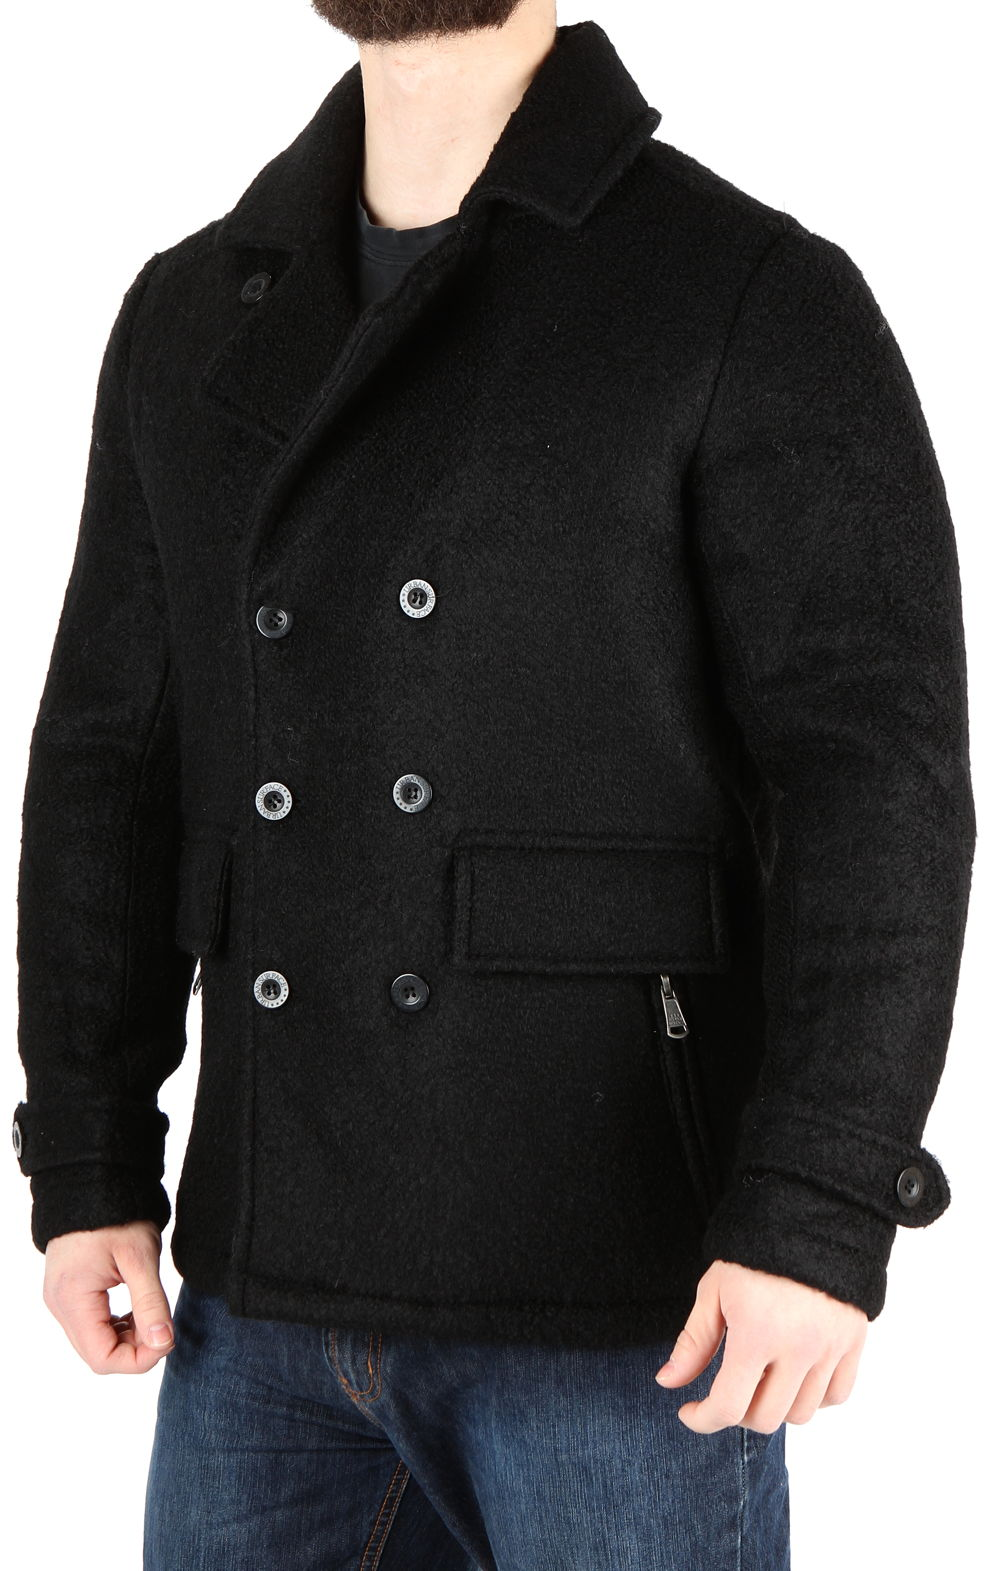 2a90c9f931 Urban Surface Férfi elegáns gyapjú kabát Városi felszíni - Glami.hu